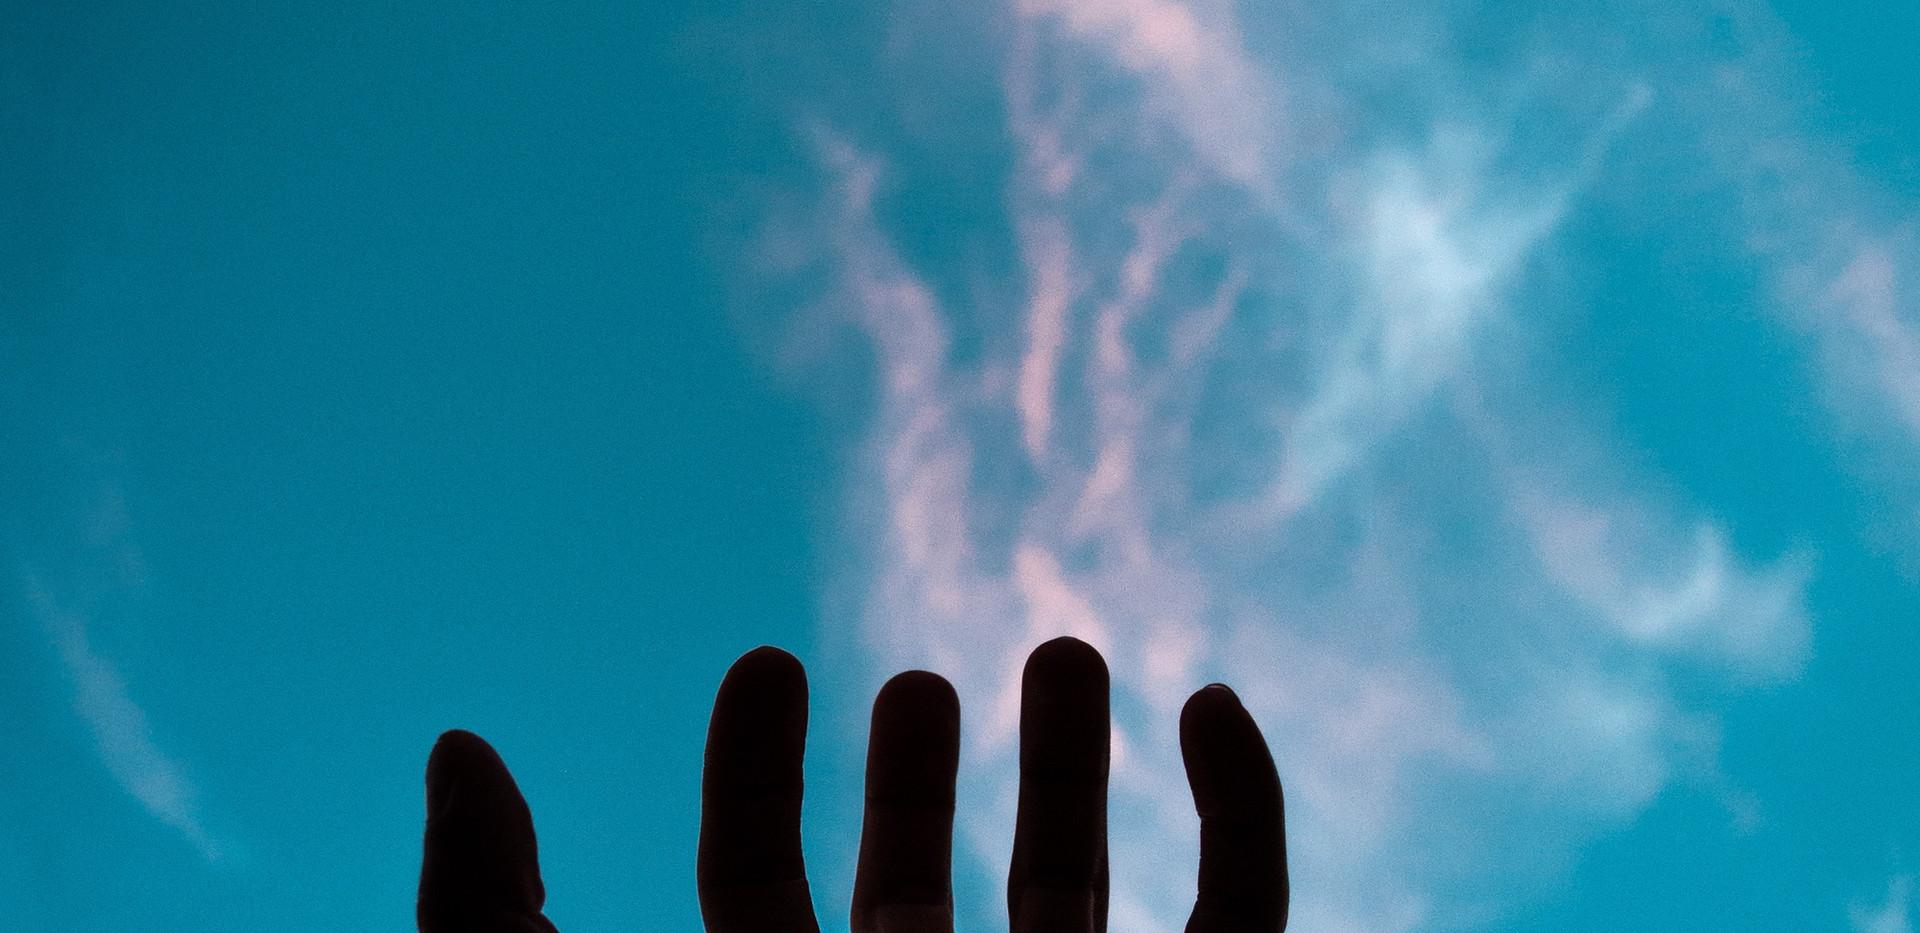 Capturing the sky